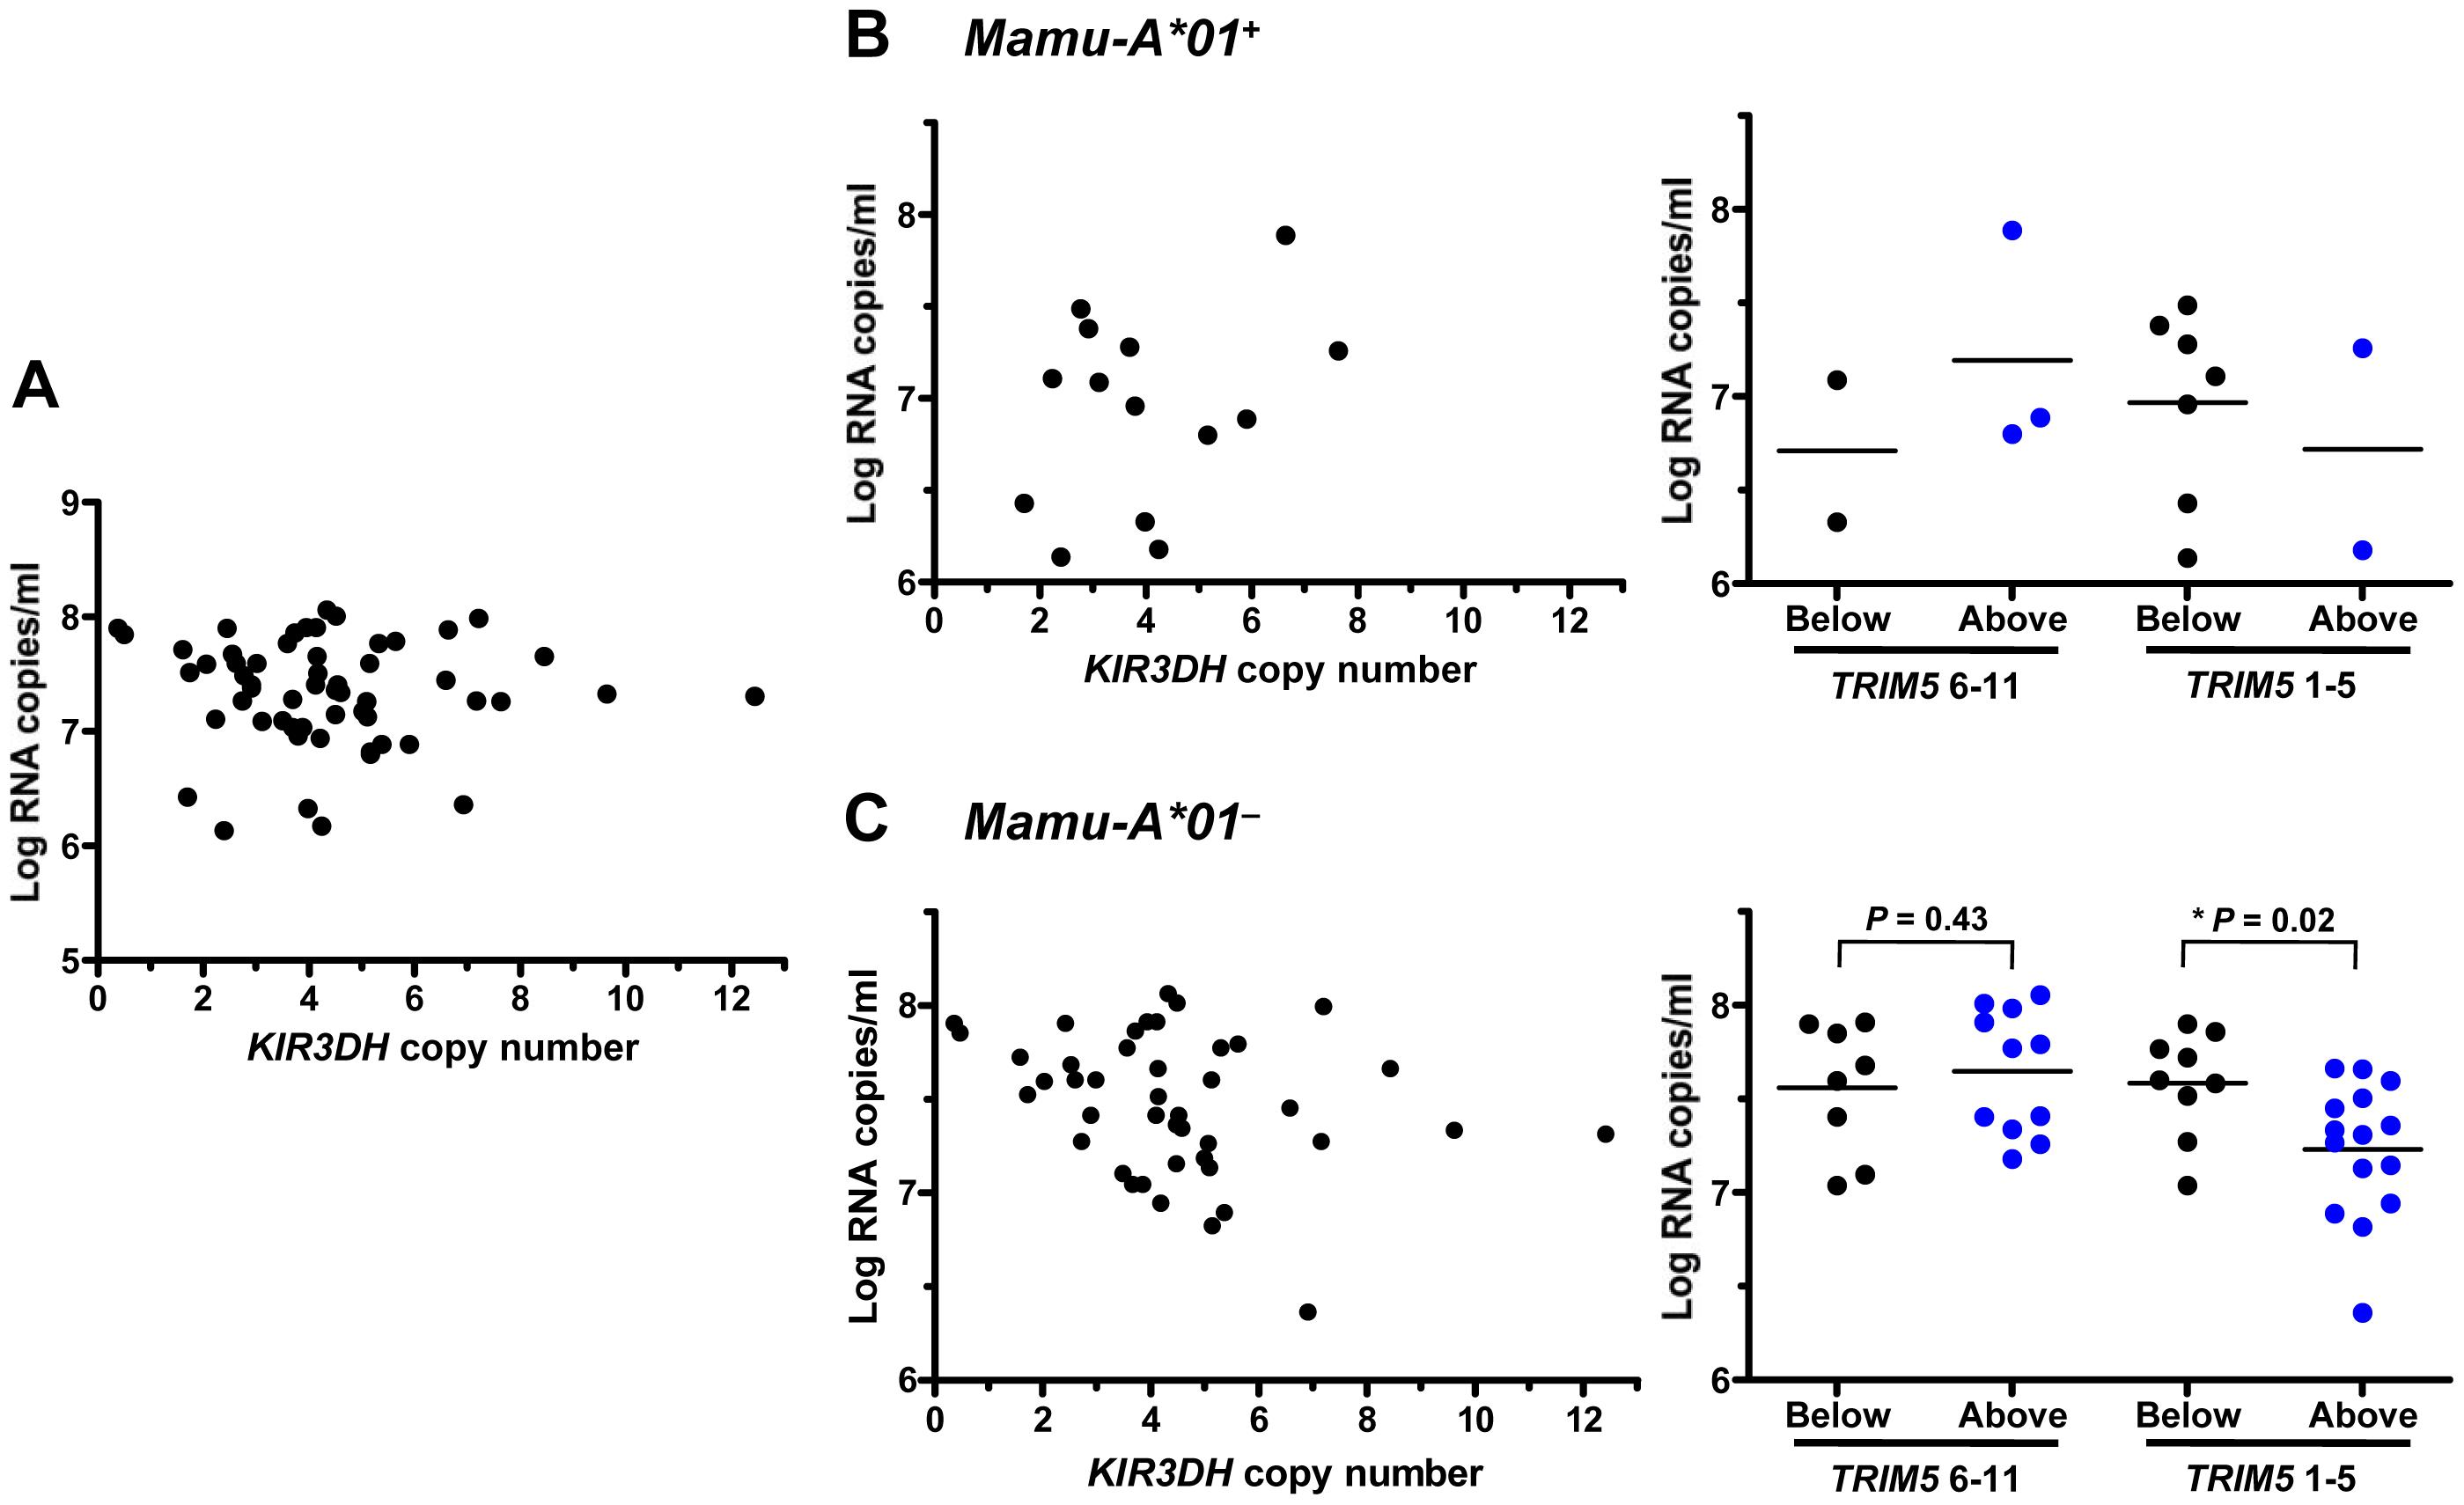 Association of <i>KIR3DH</i> copy numbers and peak plasma SIV RNA levels in Indian-origin rhesus monkeys.